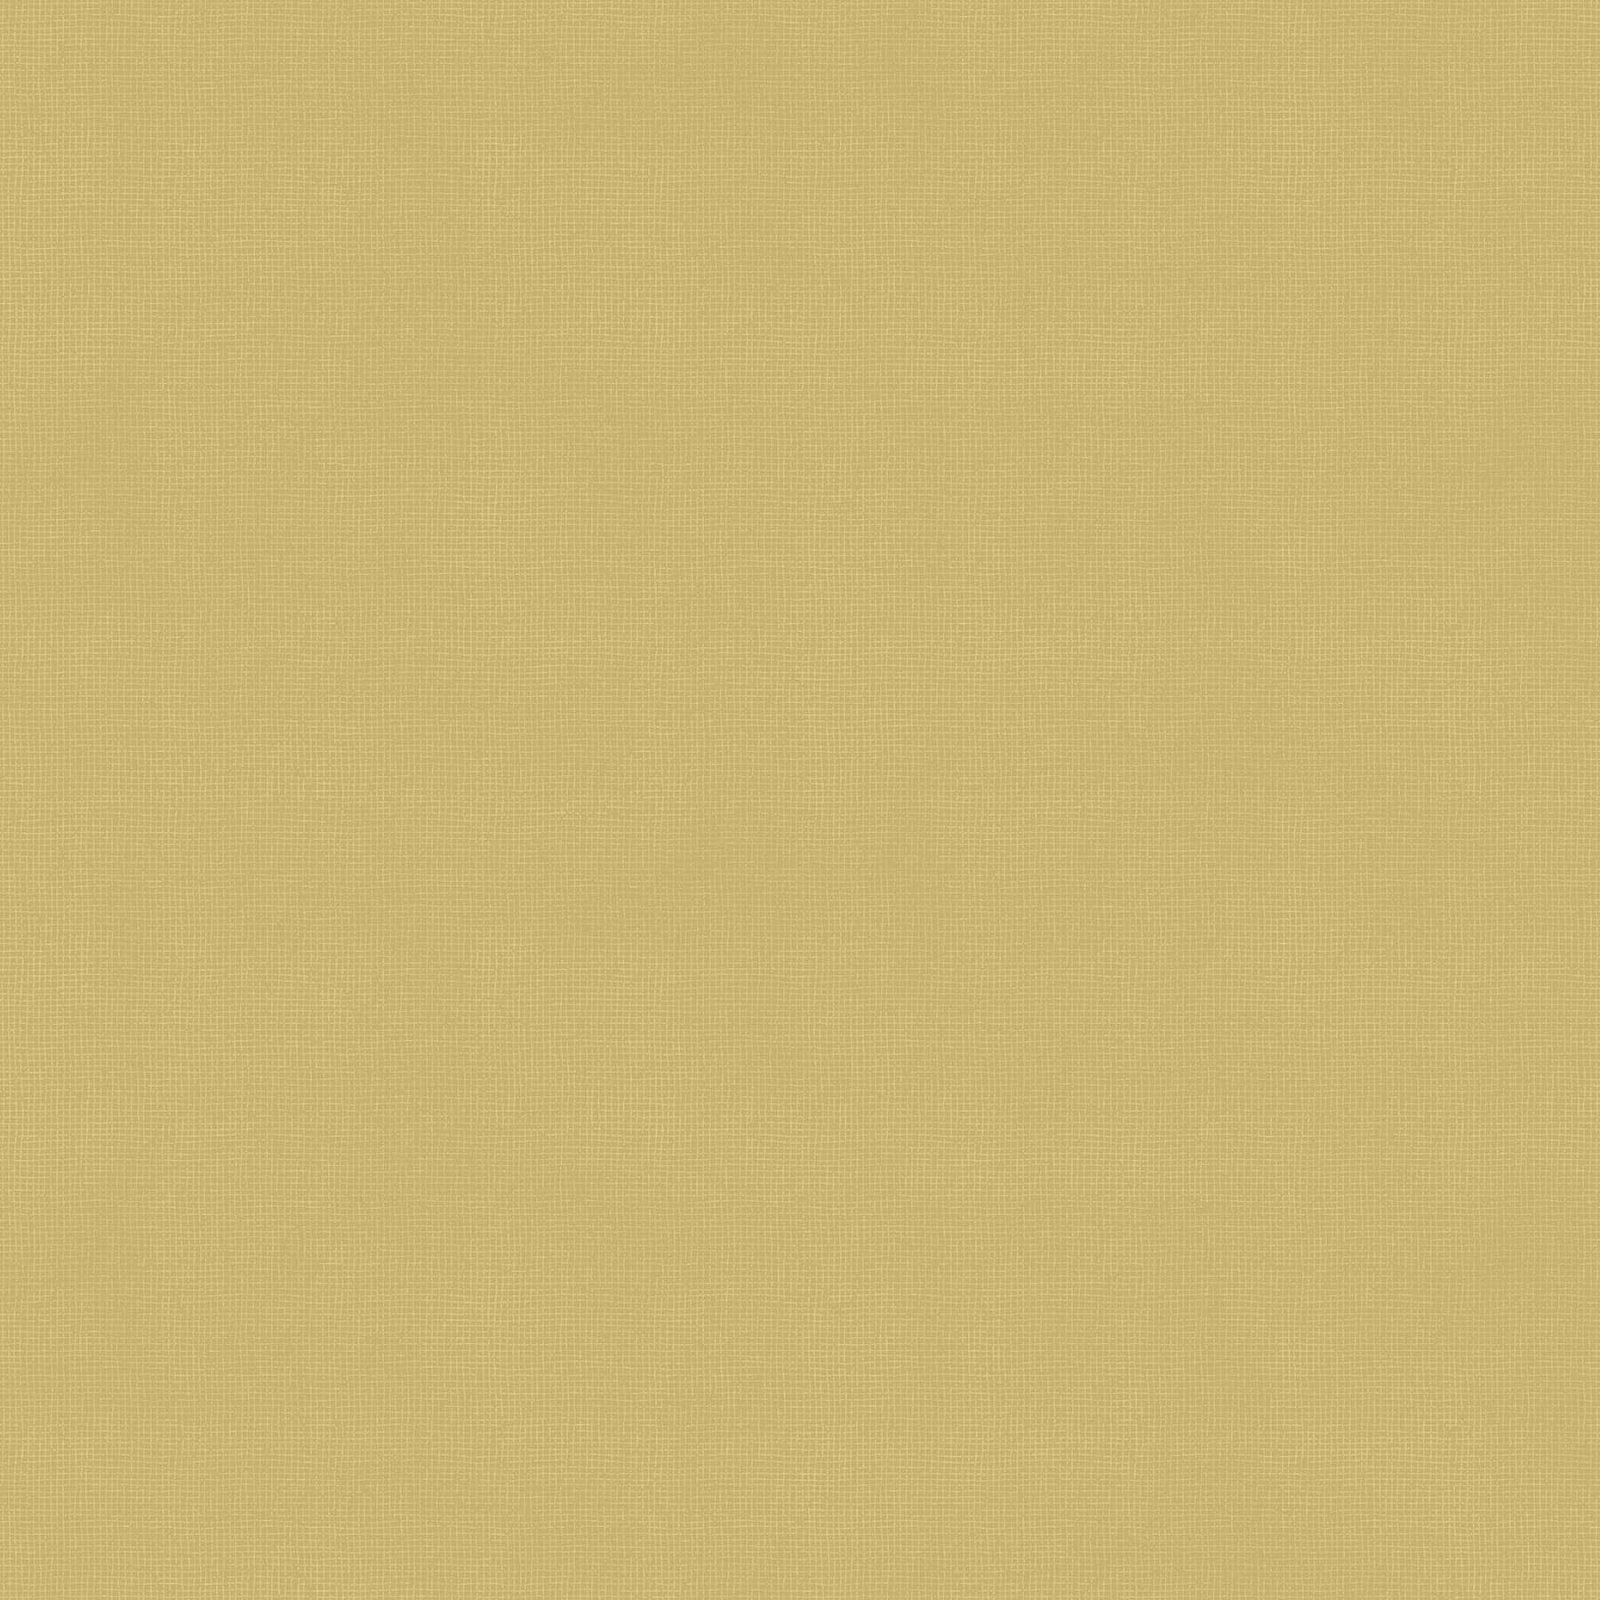 Northcott- Urban Grunge 22682 (color 54)